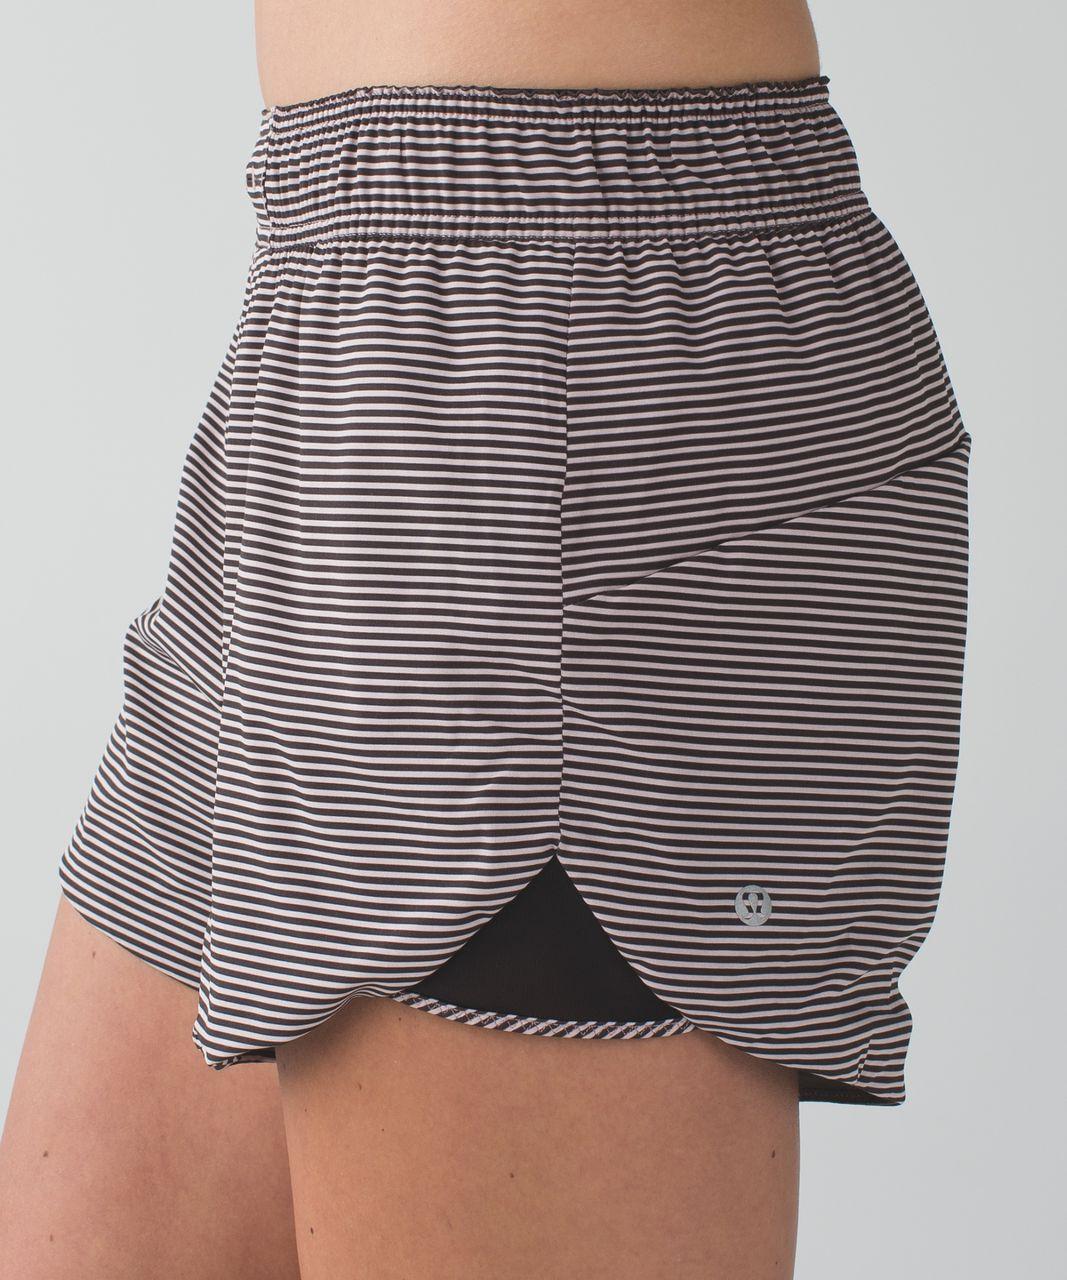 Lululemon Go The Distance Short - Mini Pop Stripe Printed Mink Berry Black / Heathered Slate